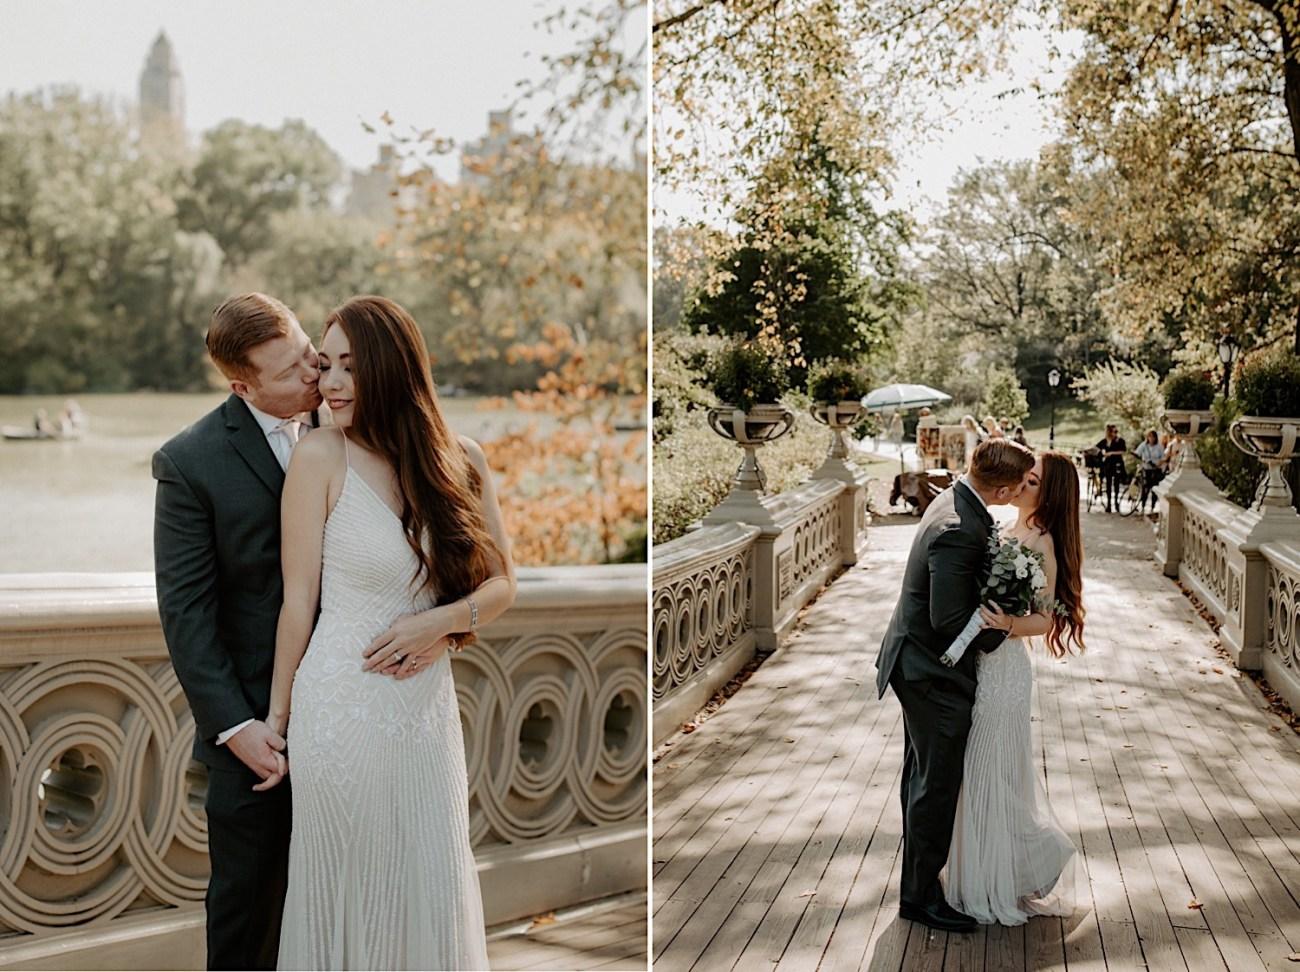 Central Park Wedding Photos Central Park Elopement NYC Wedding Photographer 29